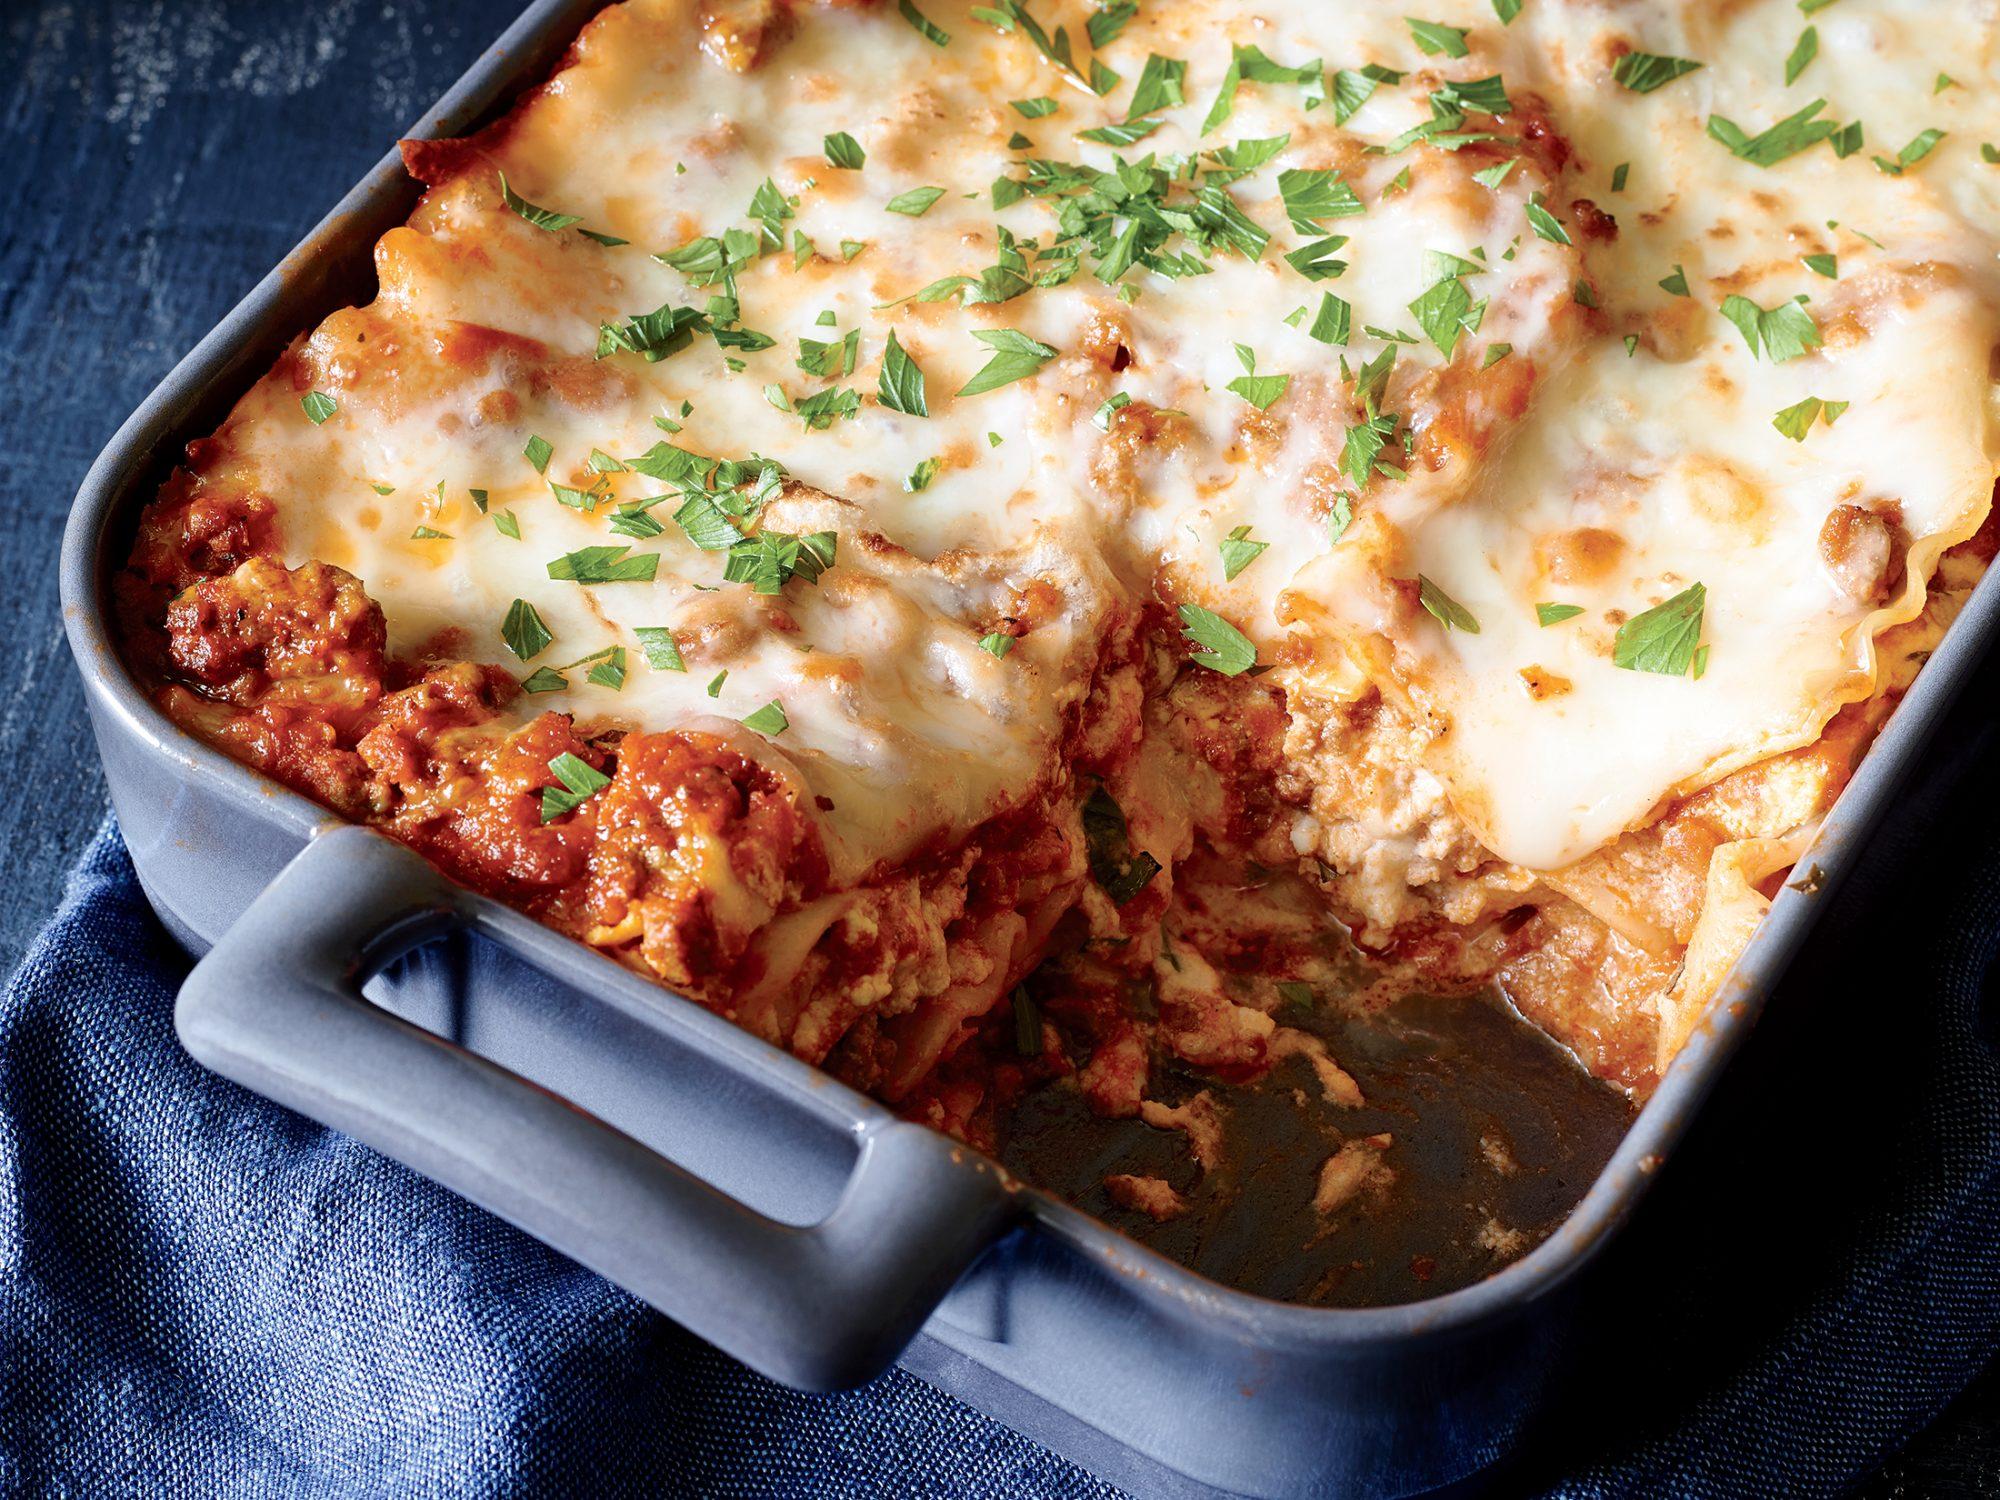 Keto Lasagna Getfitqueen.com